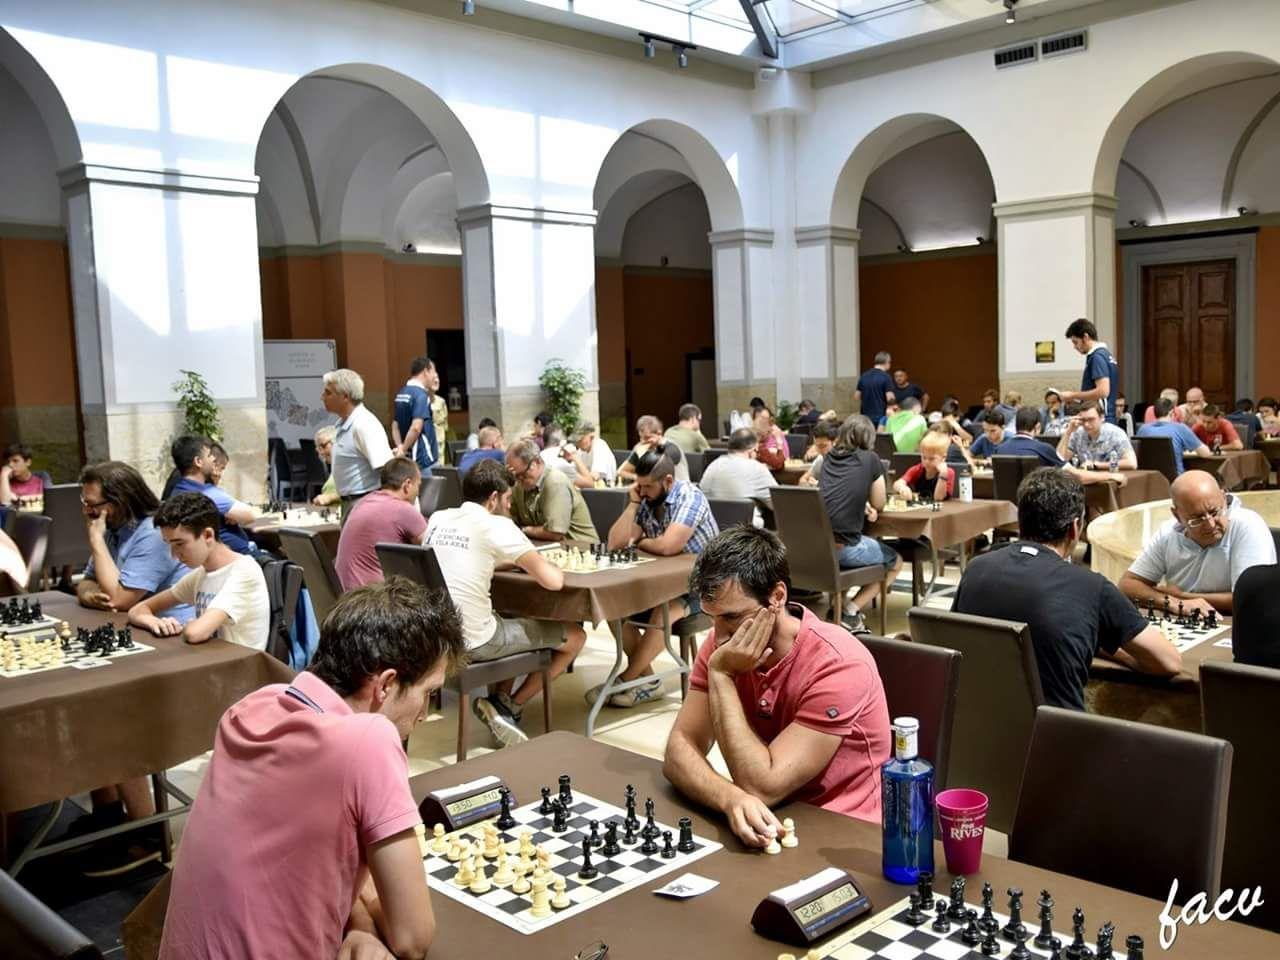 jornadas ajedrez francesch vicent segorbe 2017